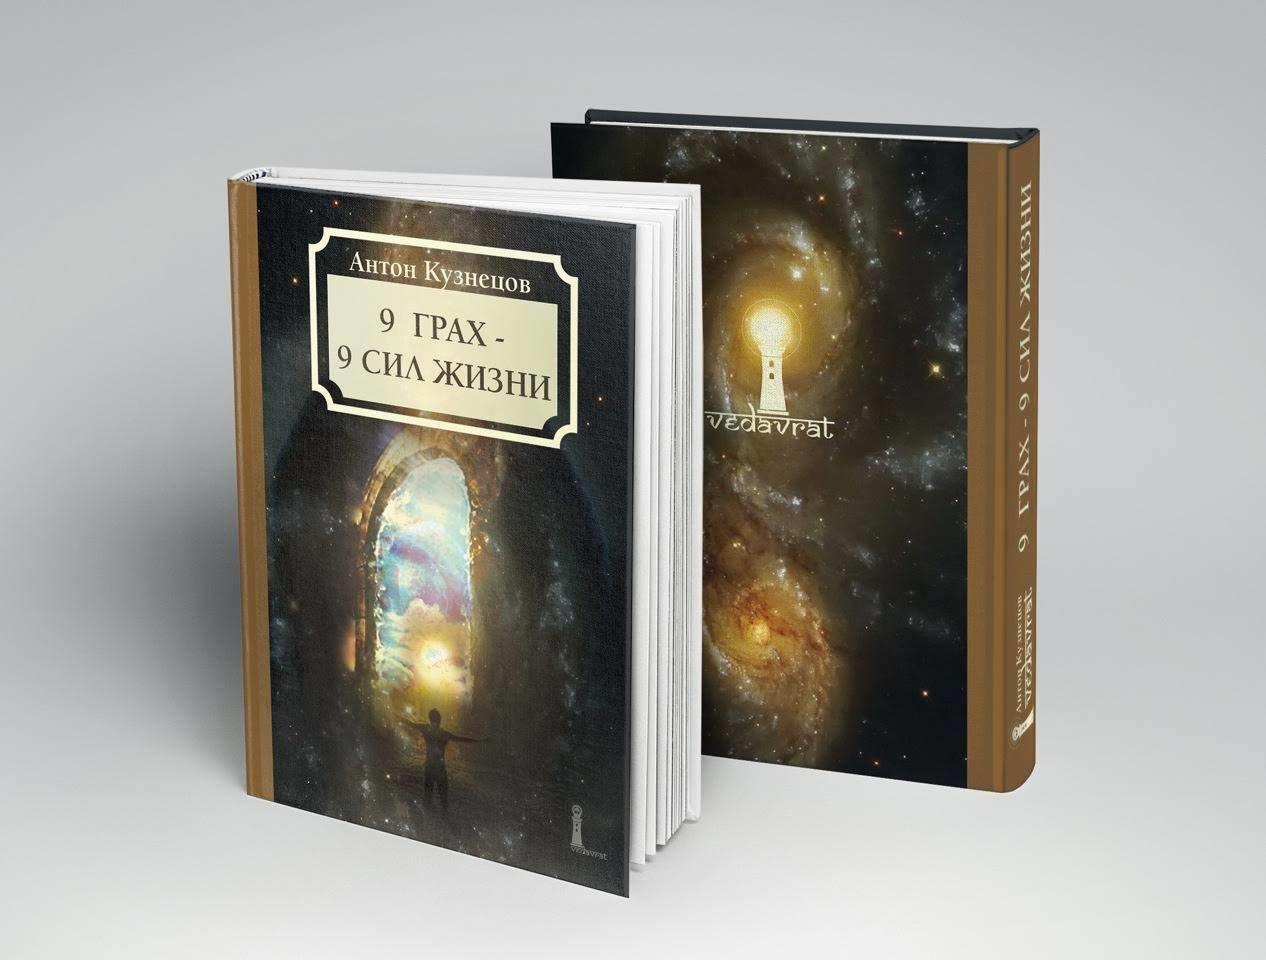 *** книга 9 Грах -- 9 Сил жизни, Антон Кузнецов Ведаврата, мастер ТантраДжйотиш, Ведическая Астрология ***